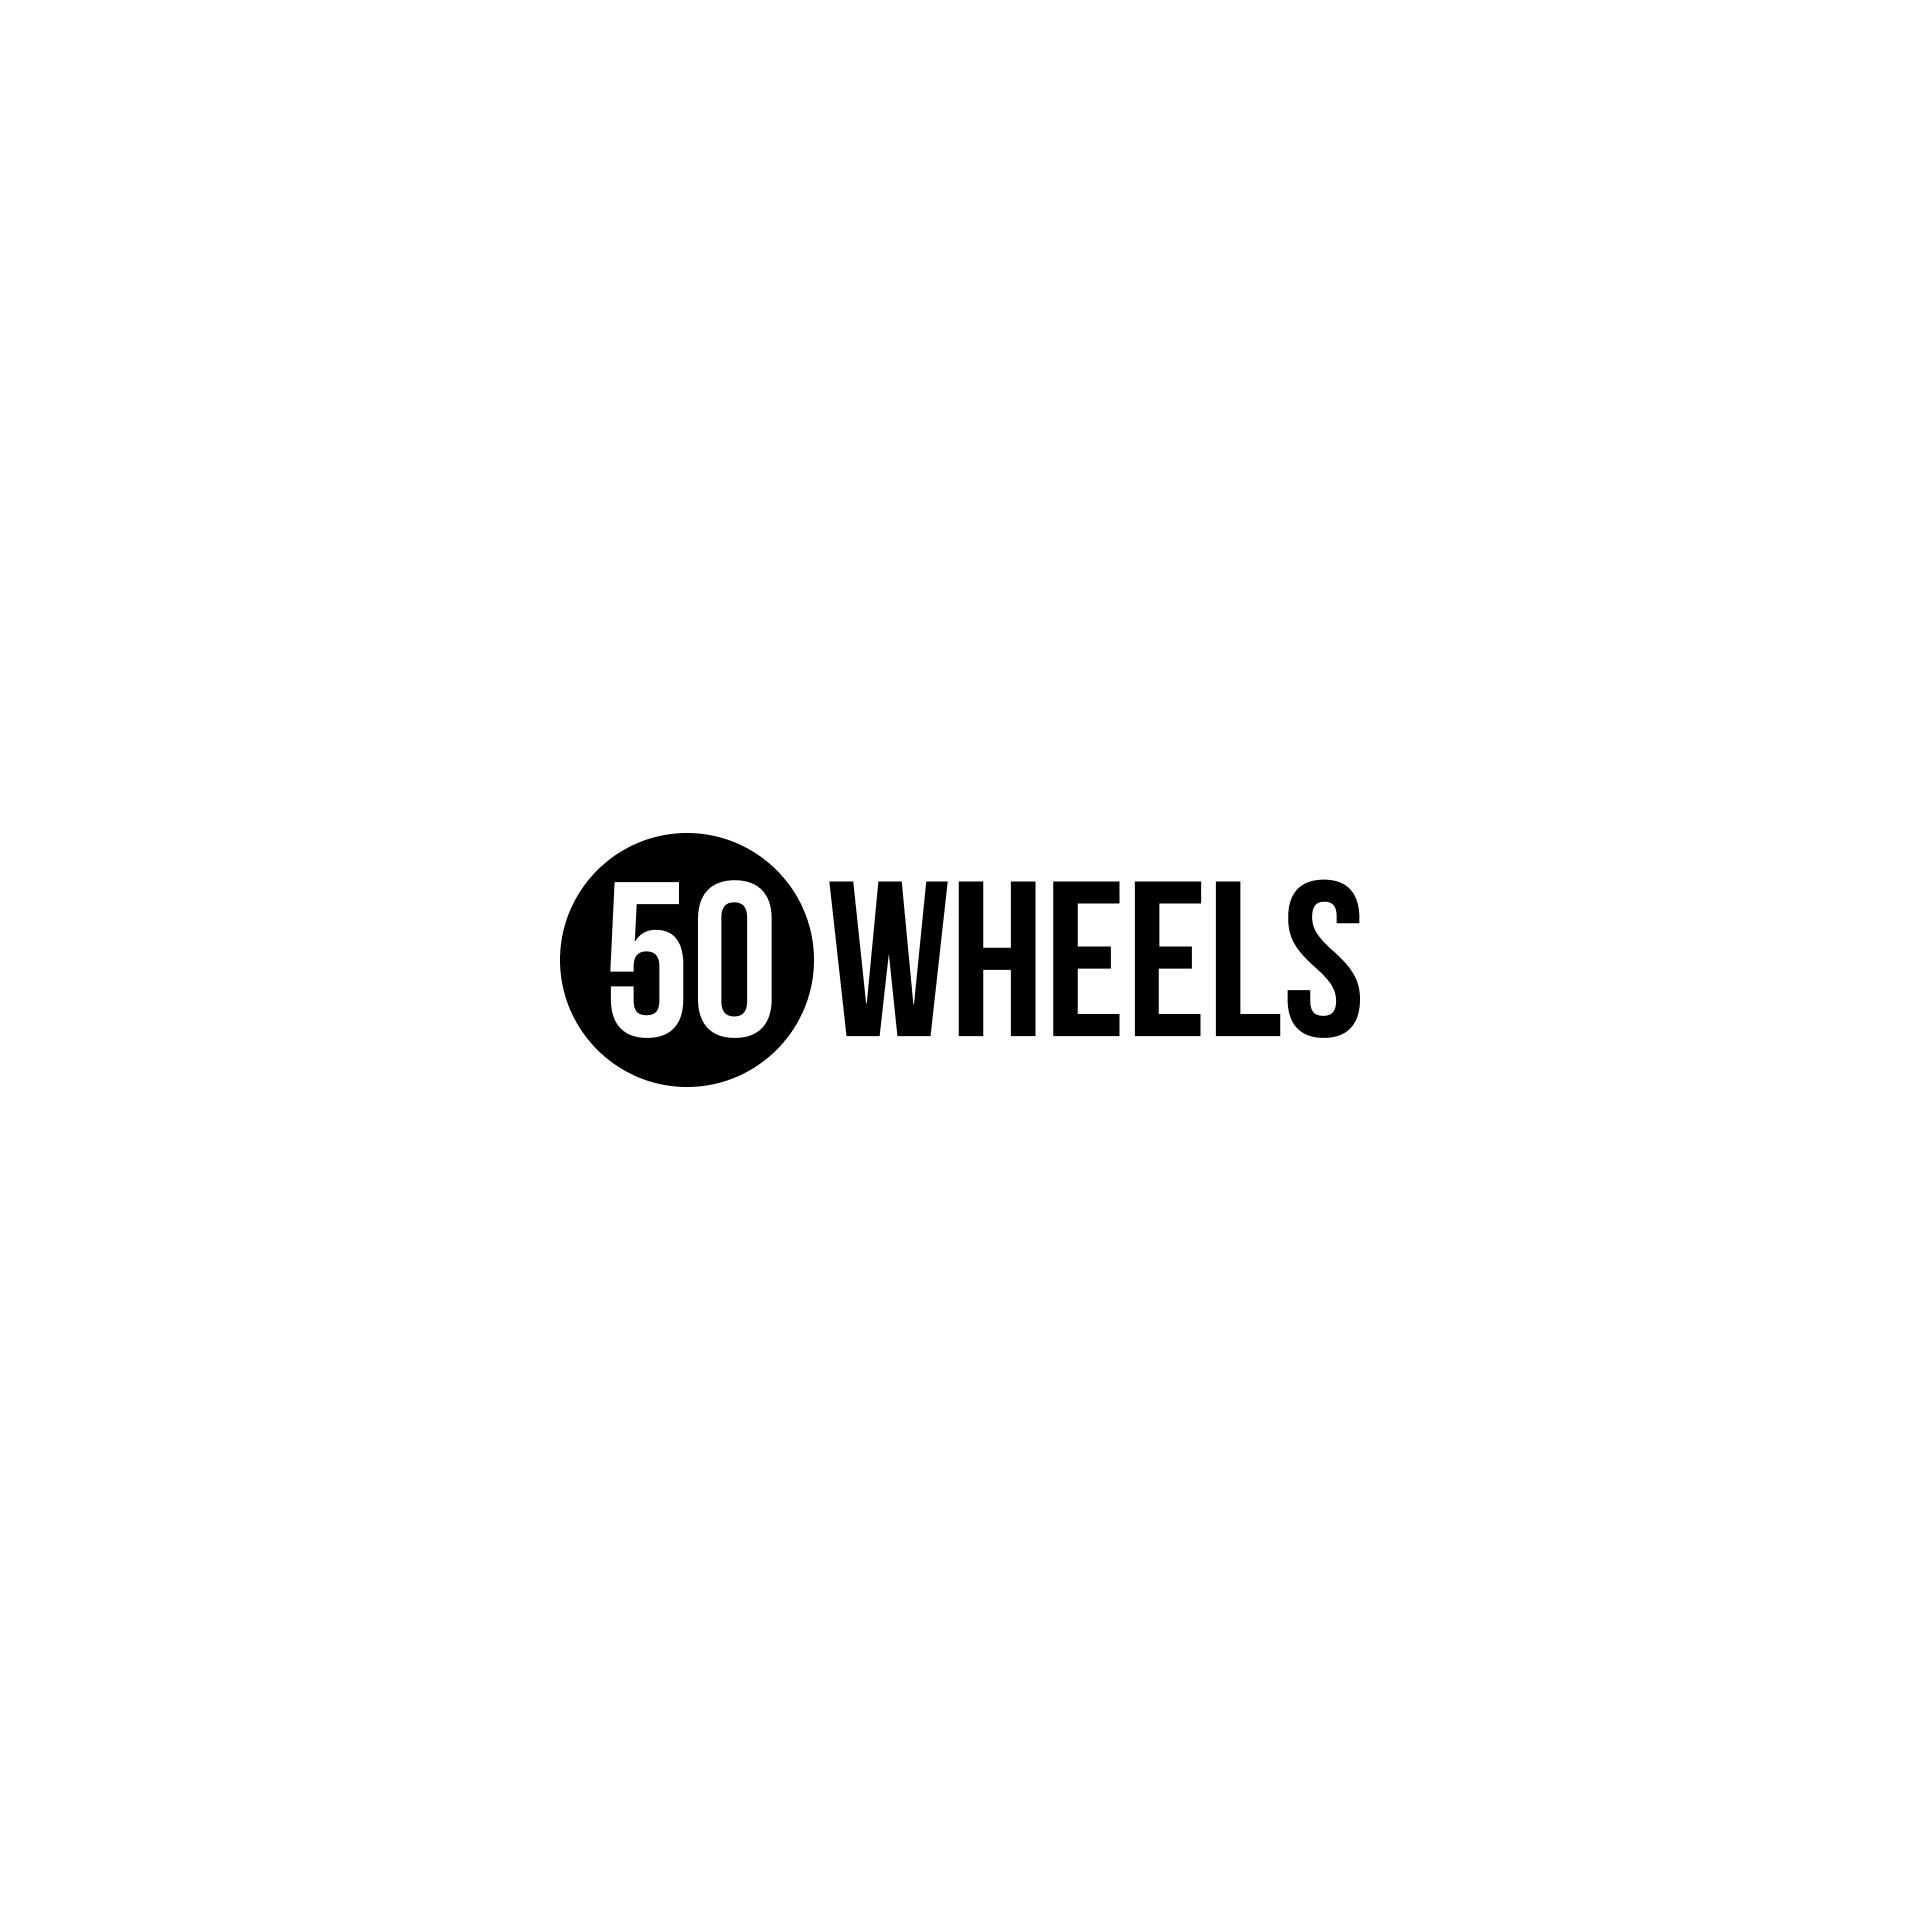 50 Wheels